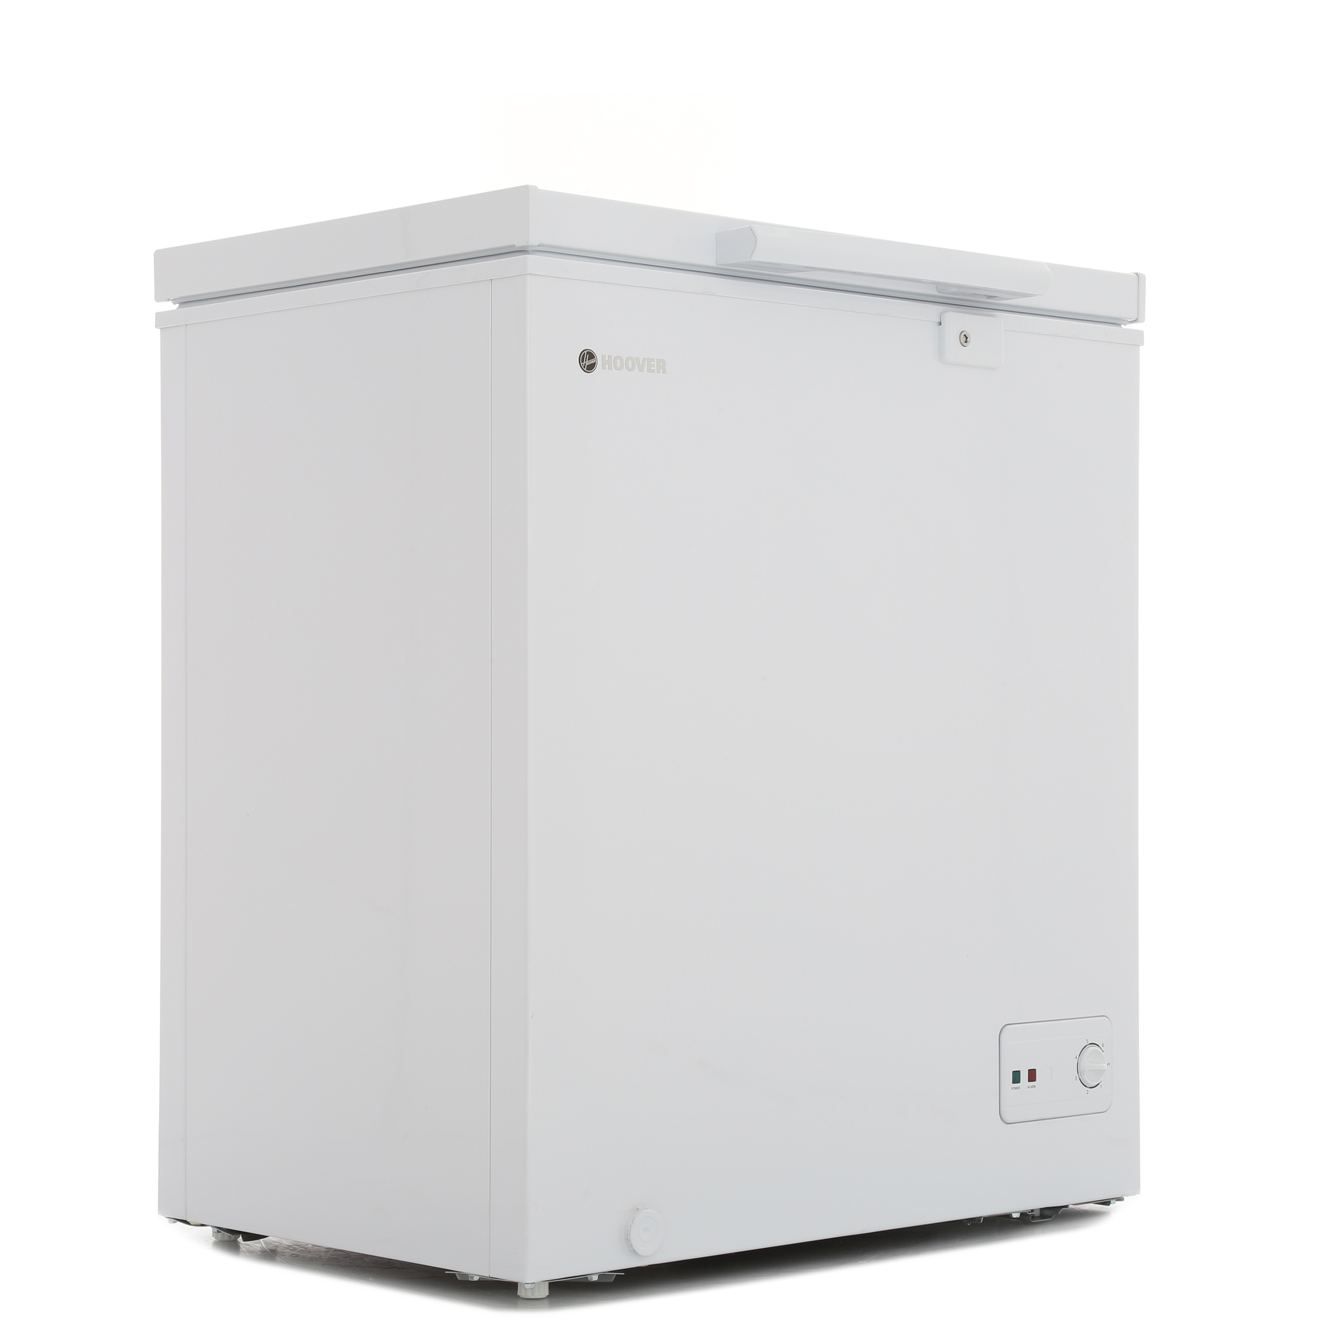 Hoover CFH157AWK Chest Freezer